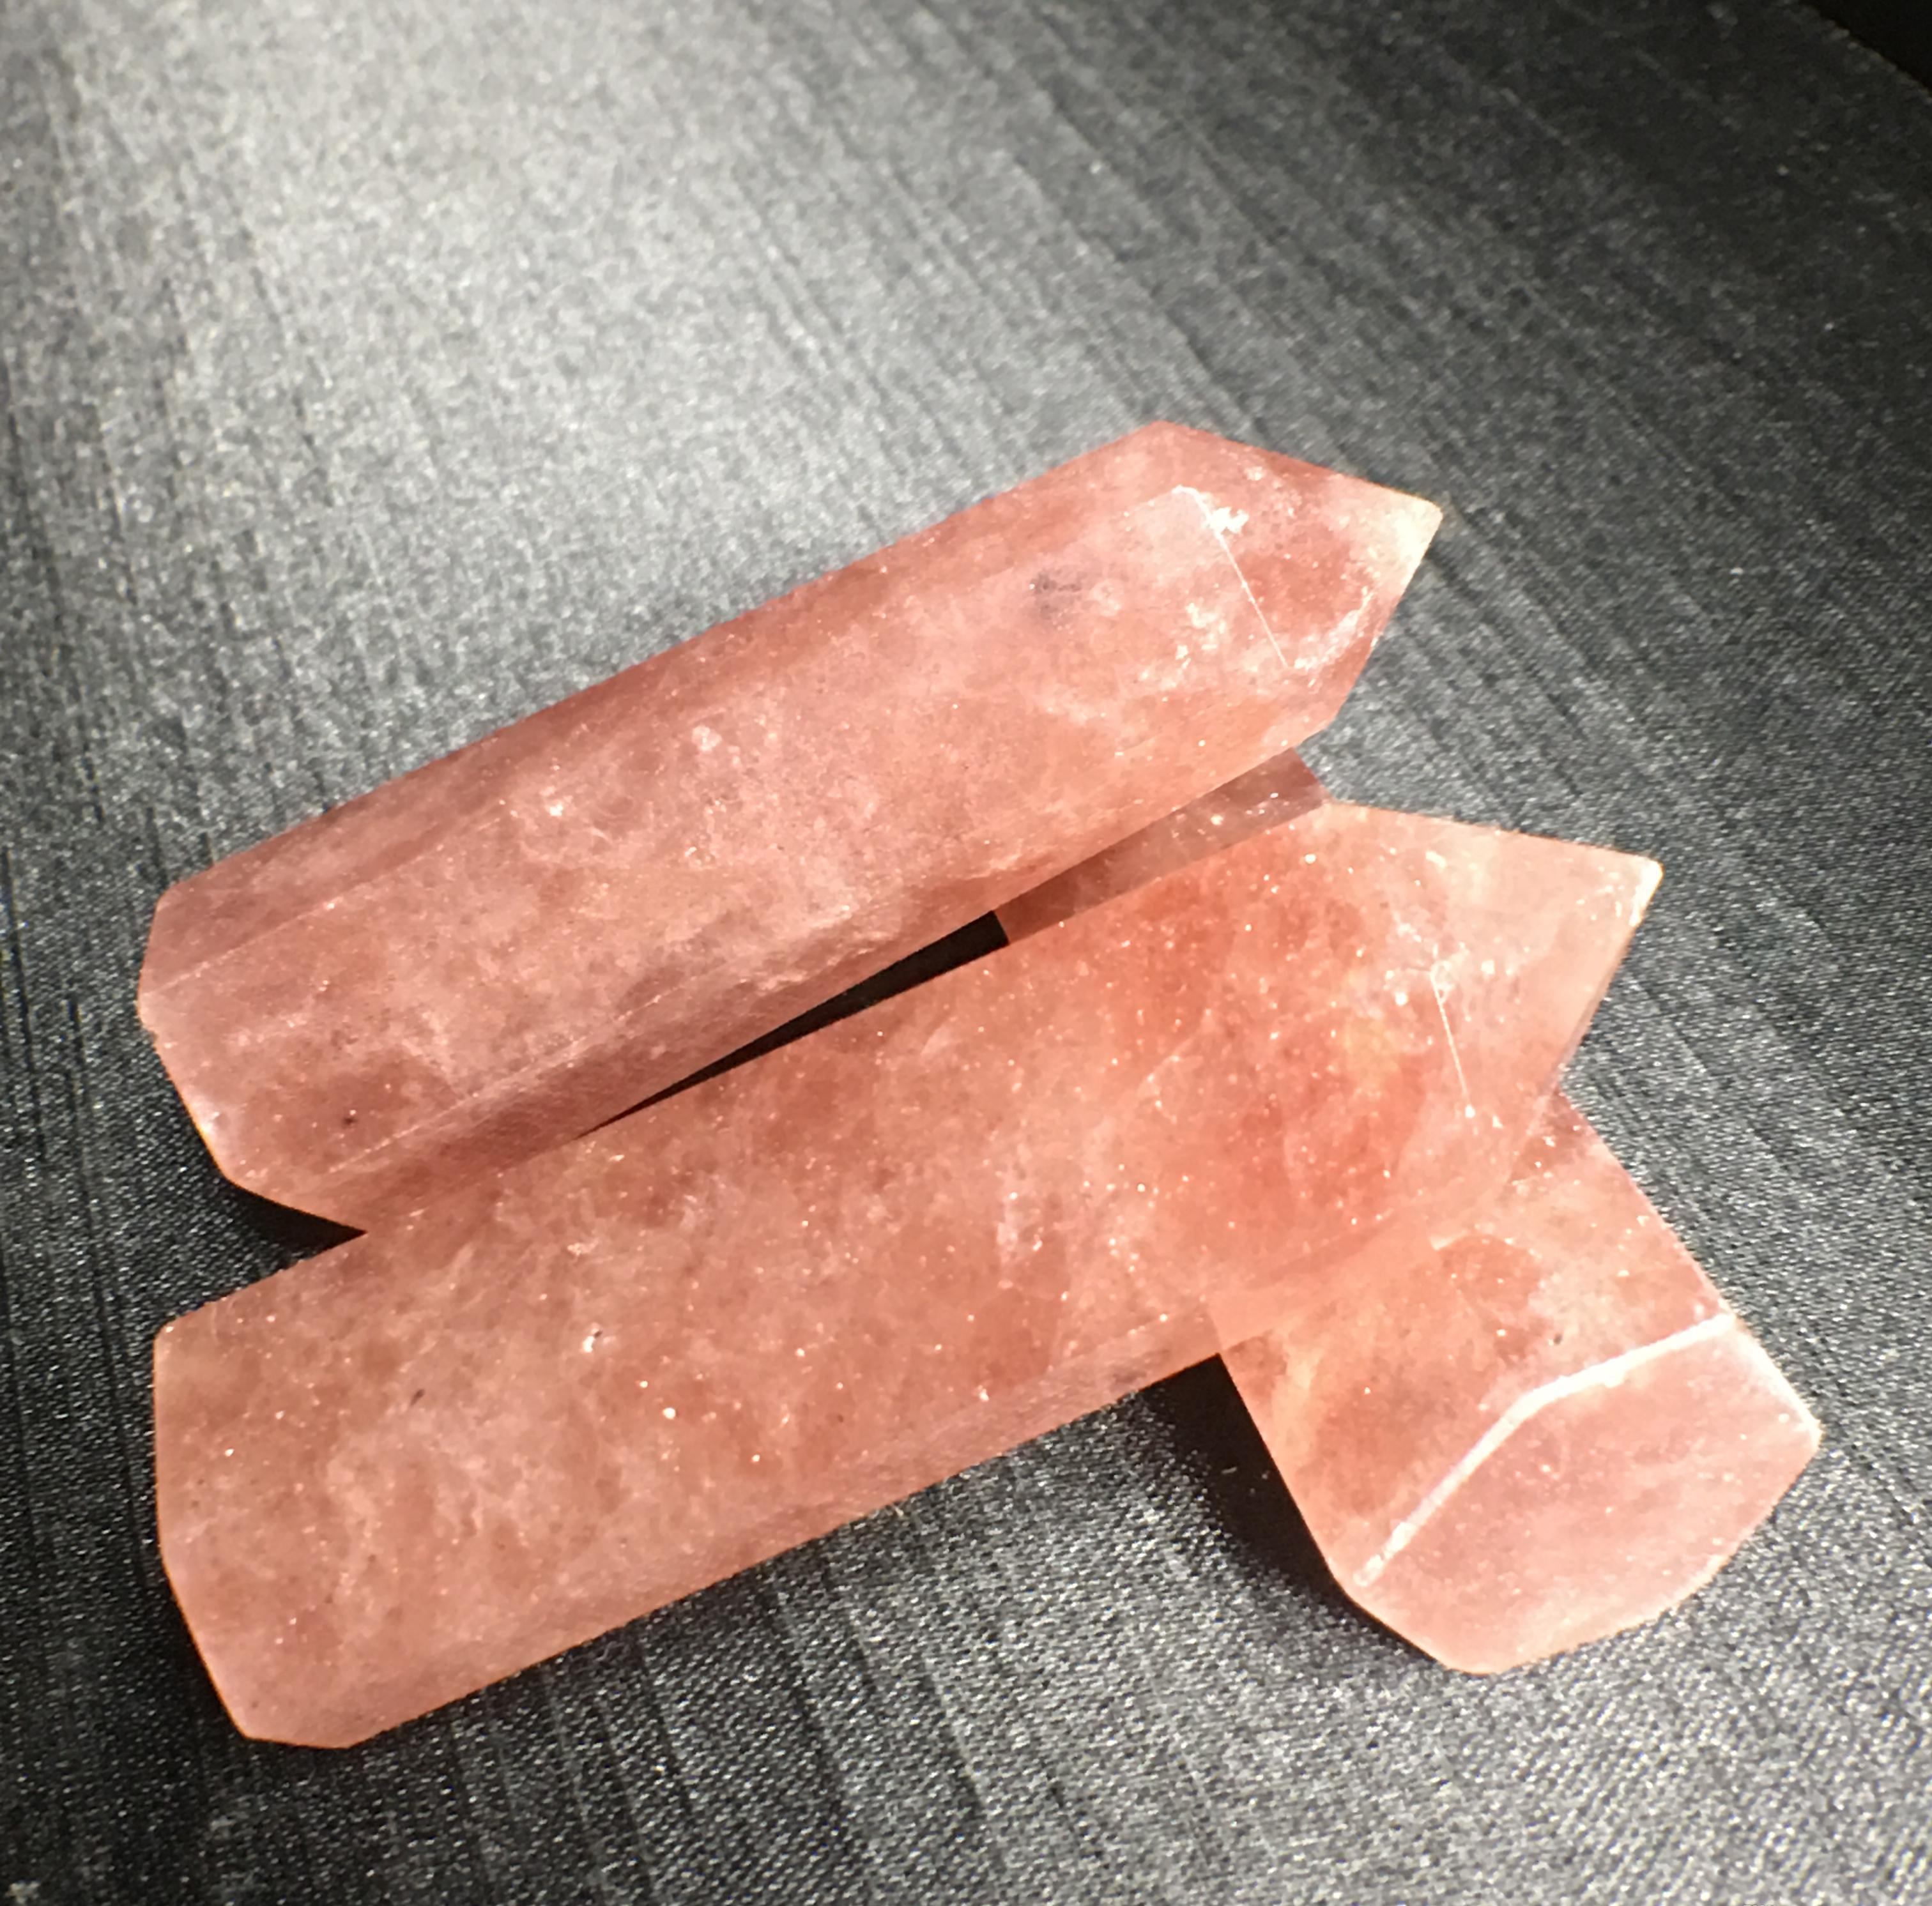 Natural Strawberry Stone Wand Red Quartz Crystal Stone Point Crystal Wand Rock Healing Crystal Gift Polished jllOEv mx_home